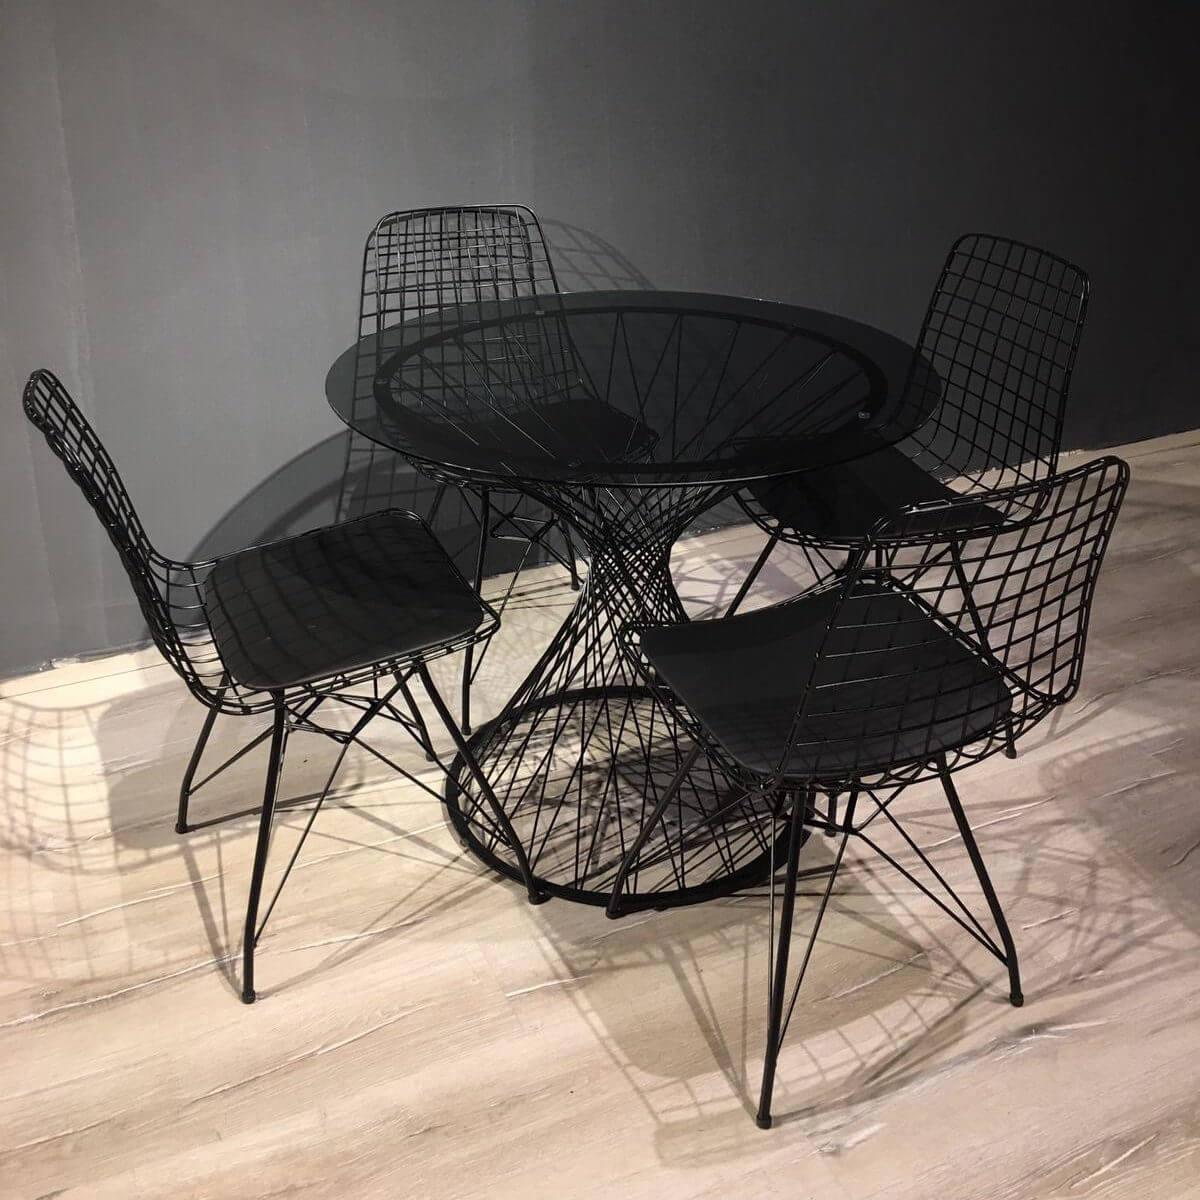 metal-masa-sandalye-takimi-yuvarlak-masa-siyah-46206